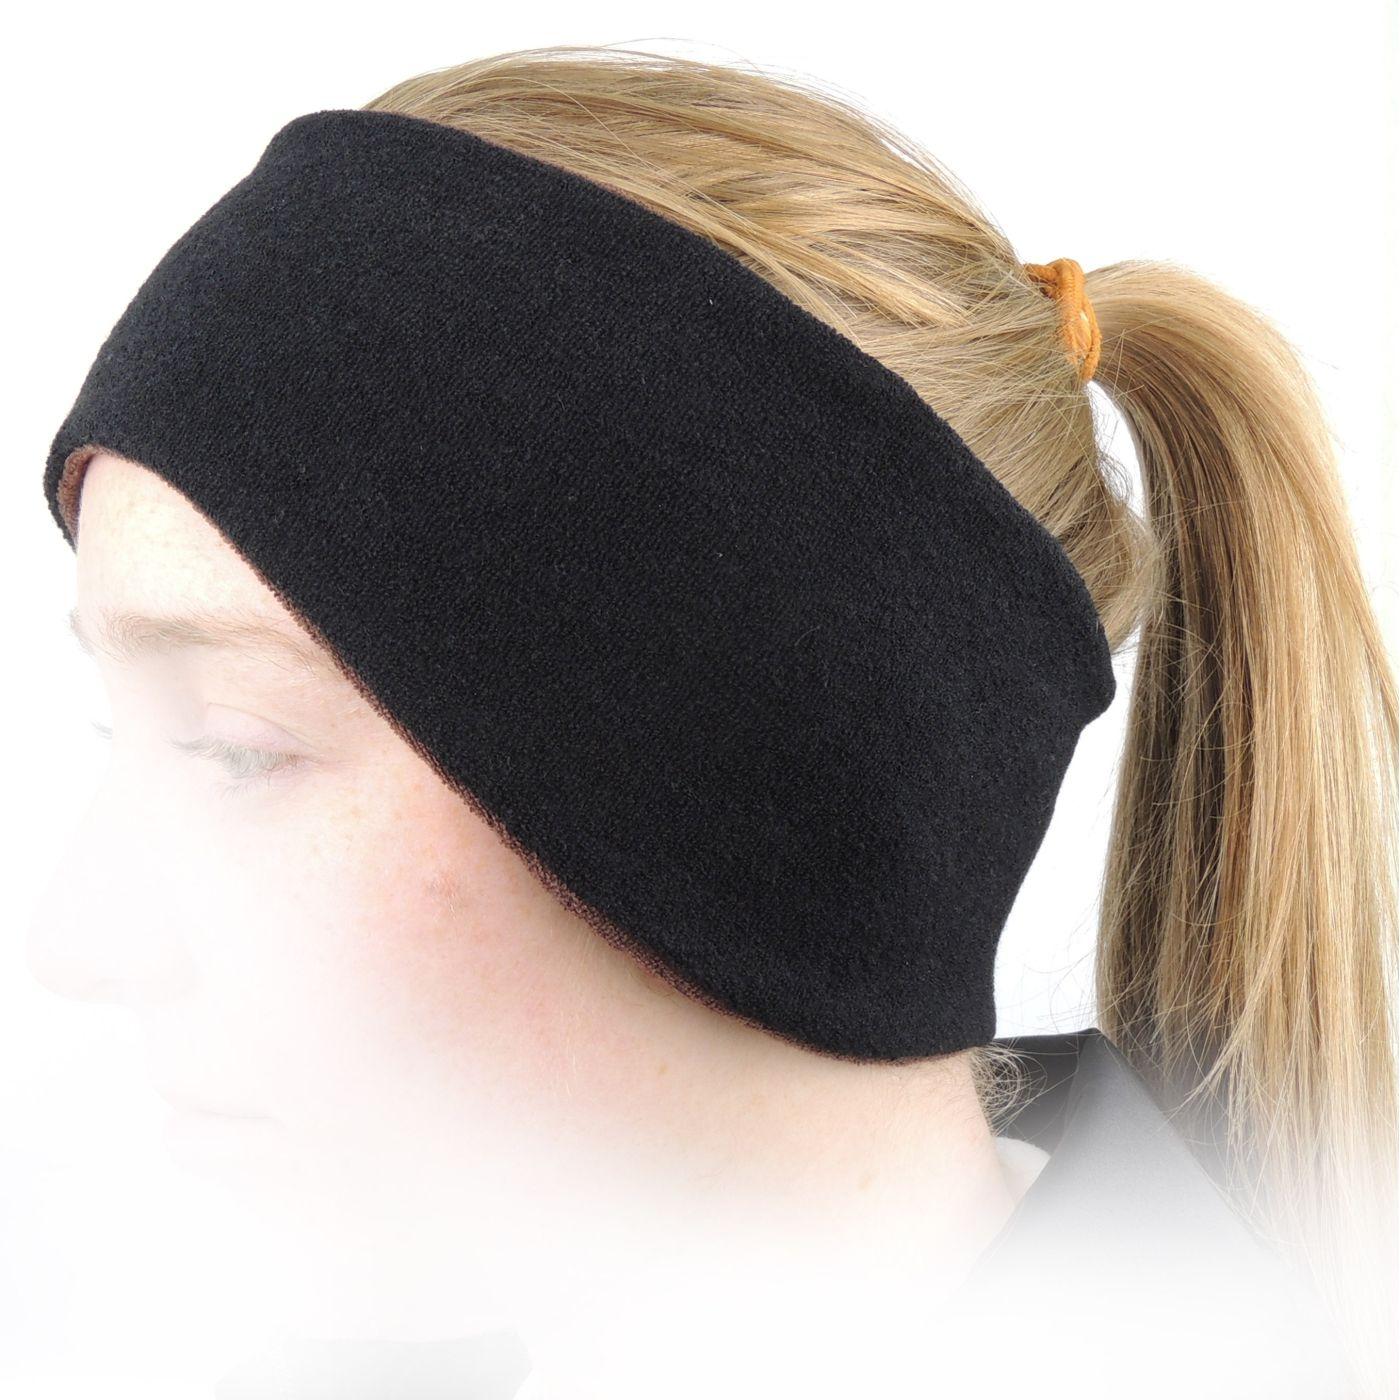 Protetor de Orelha Headband Thermo Fleece - fieroshop 711c3fe3d2d